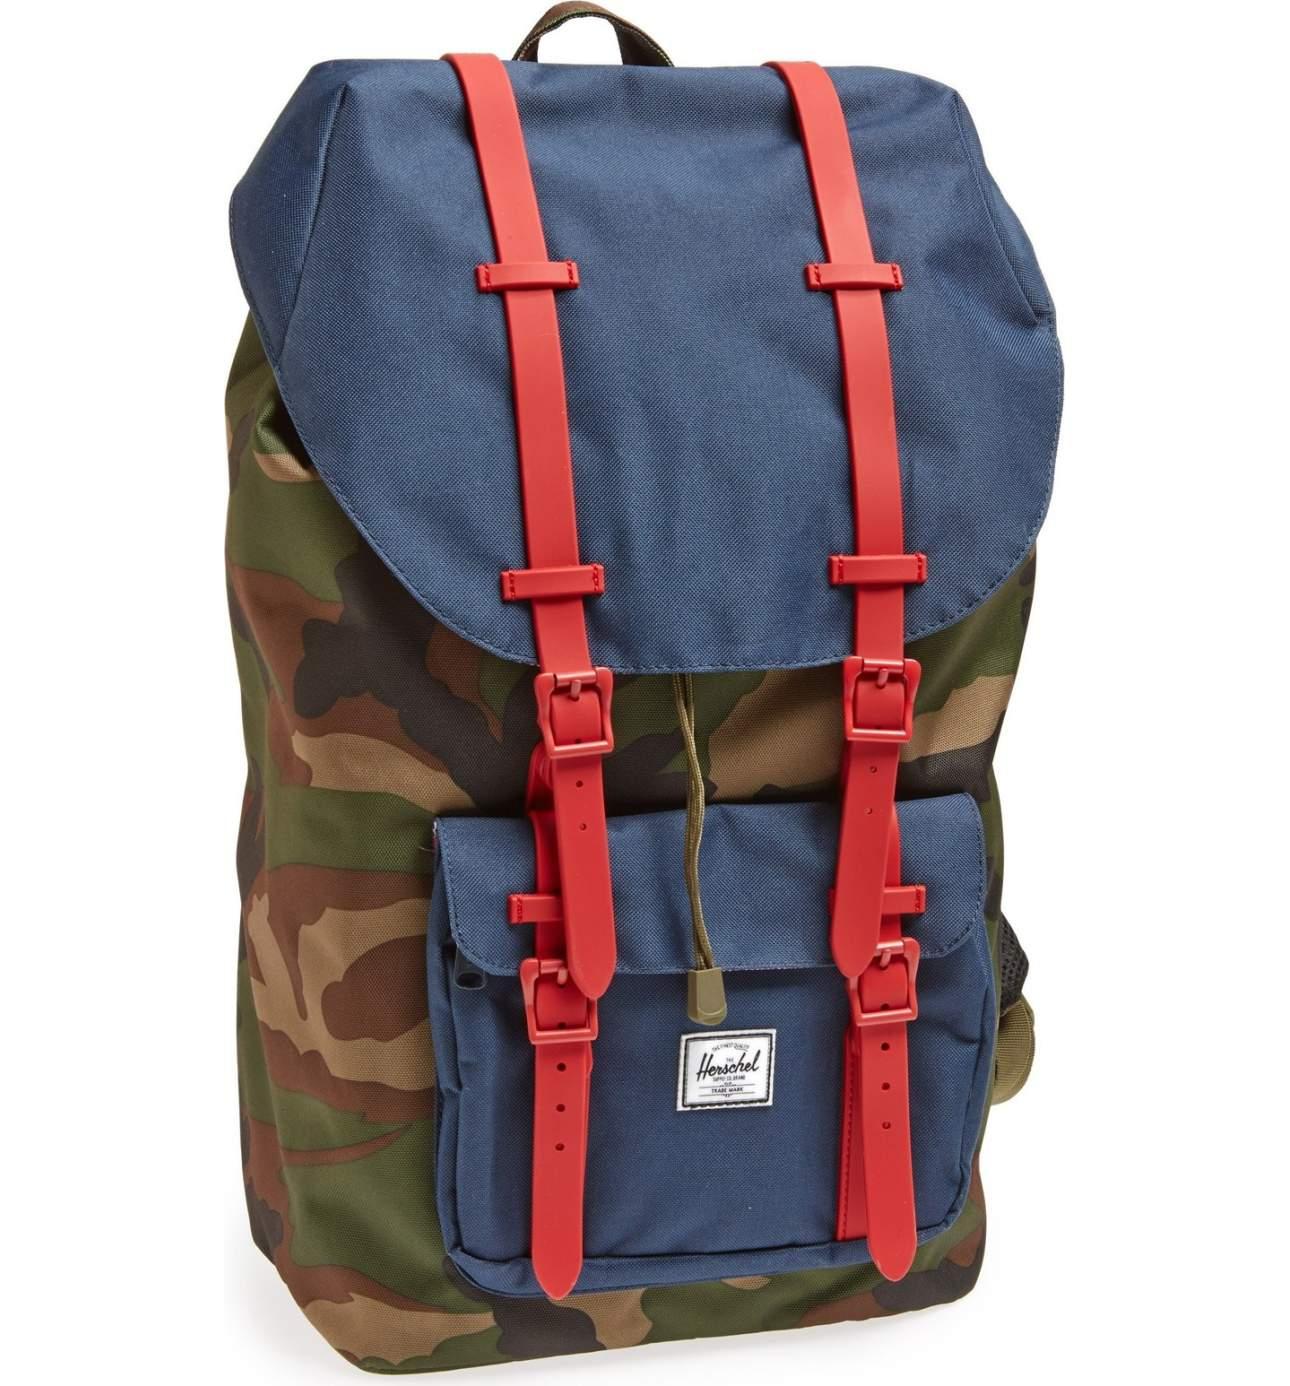 HERSCHELLLittle America Backpack